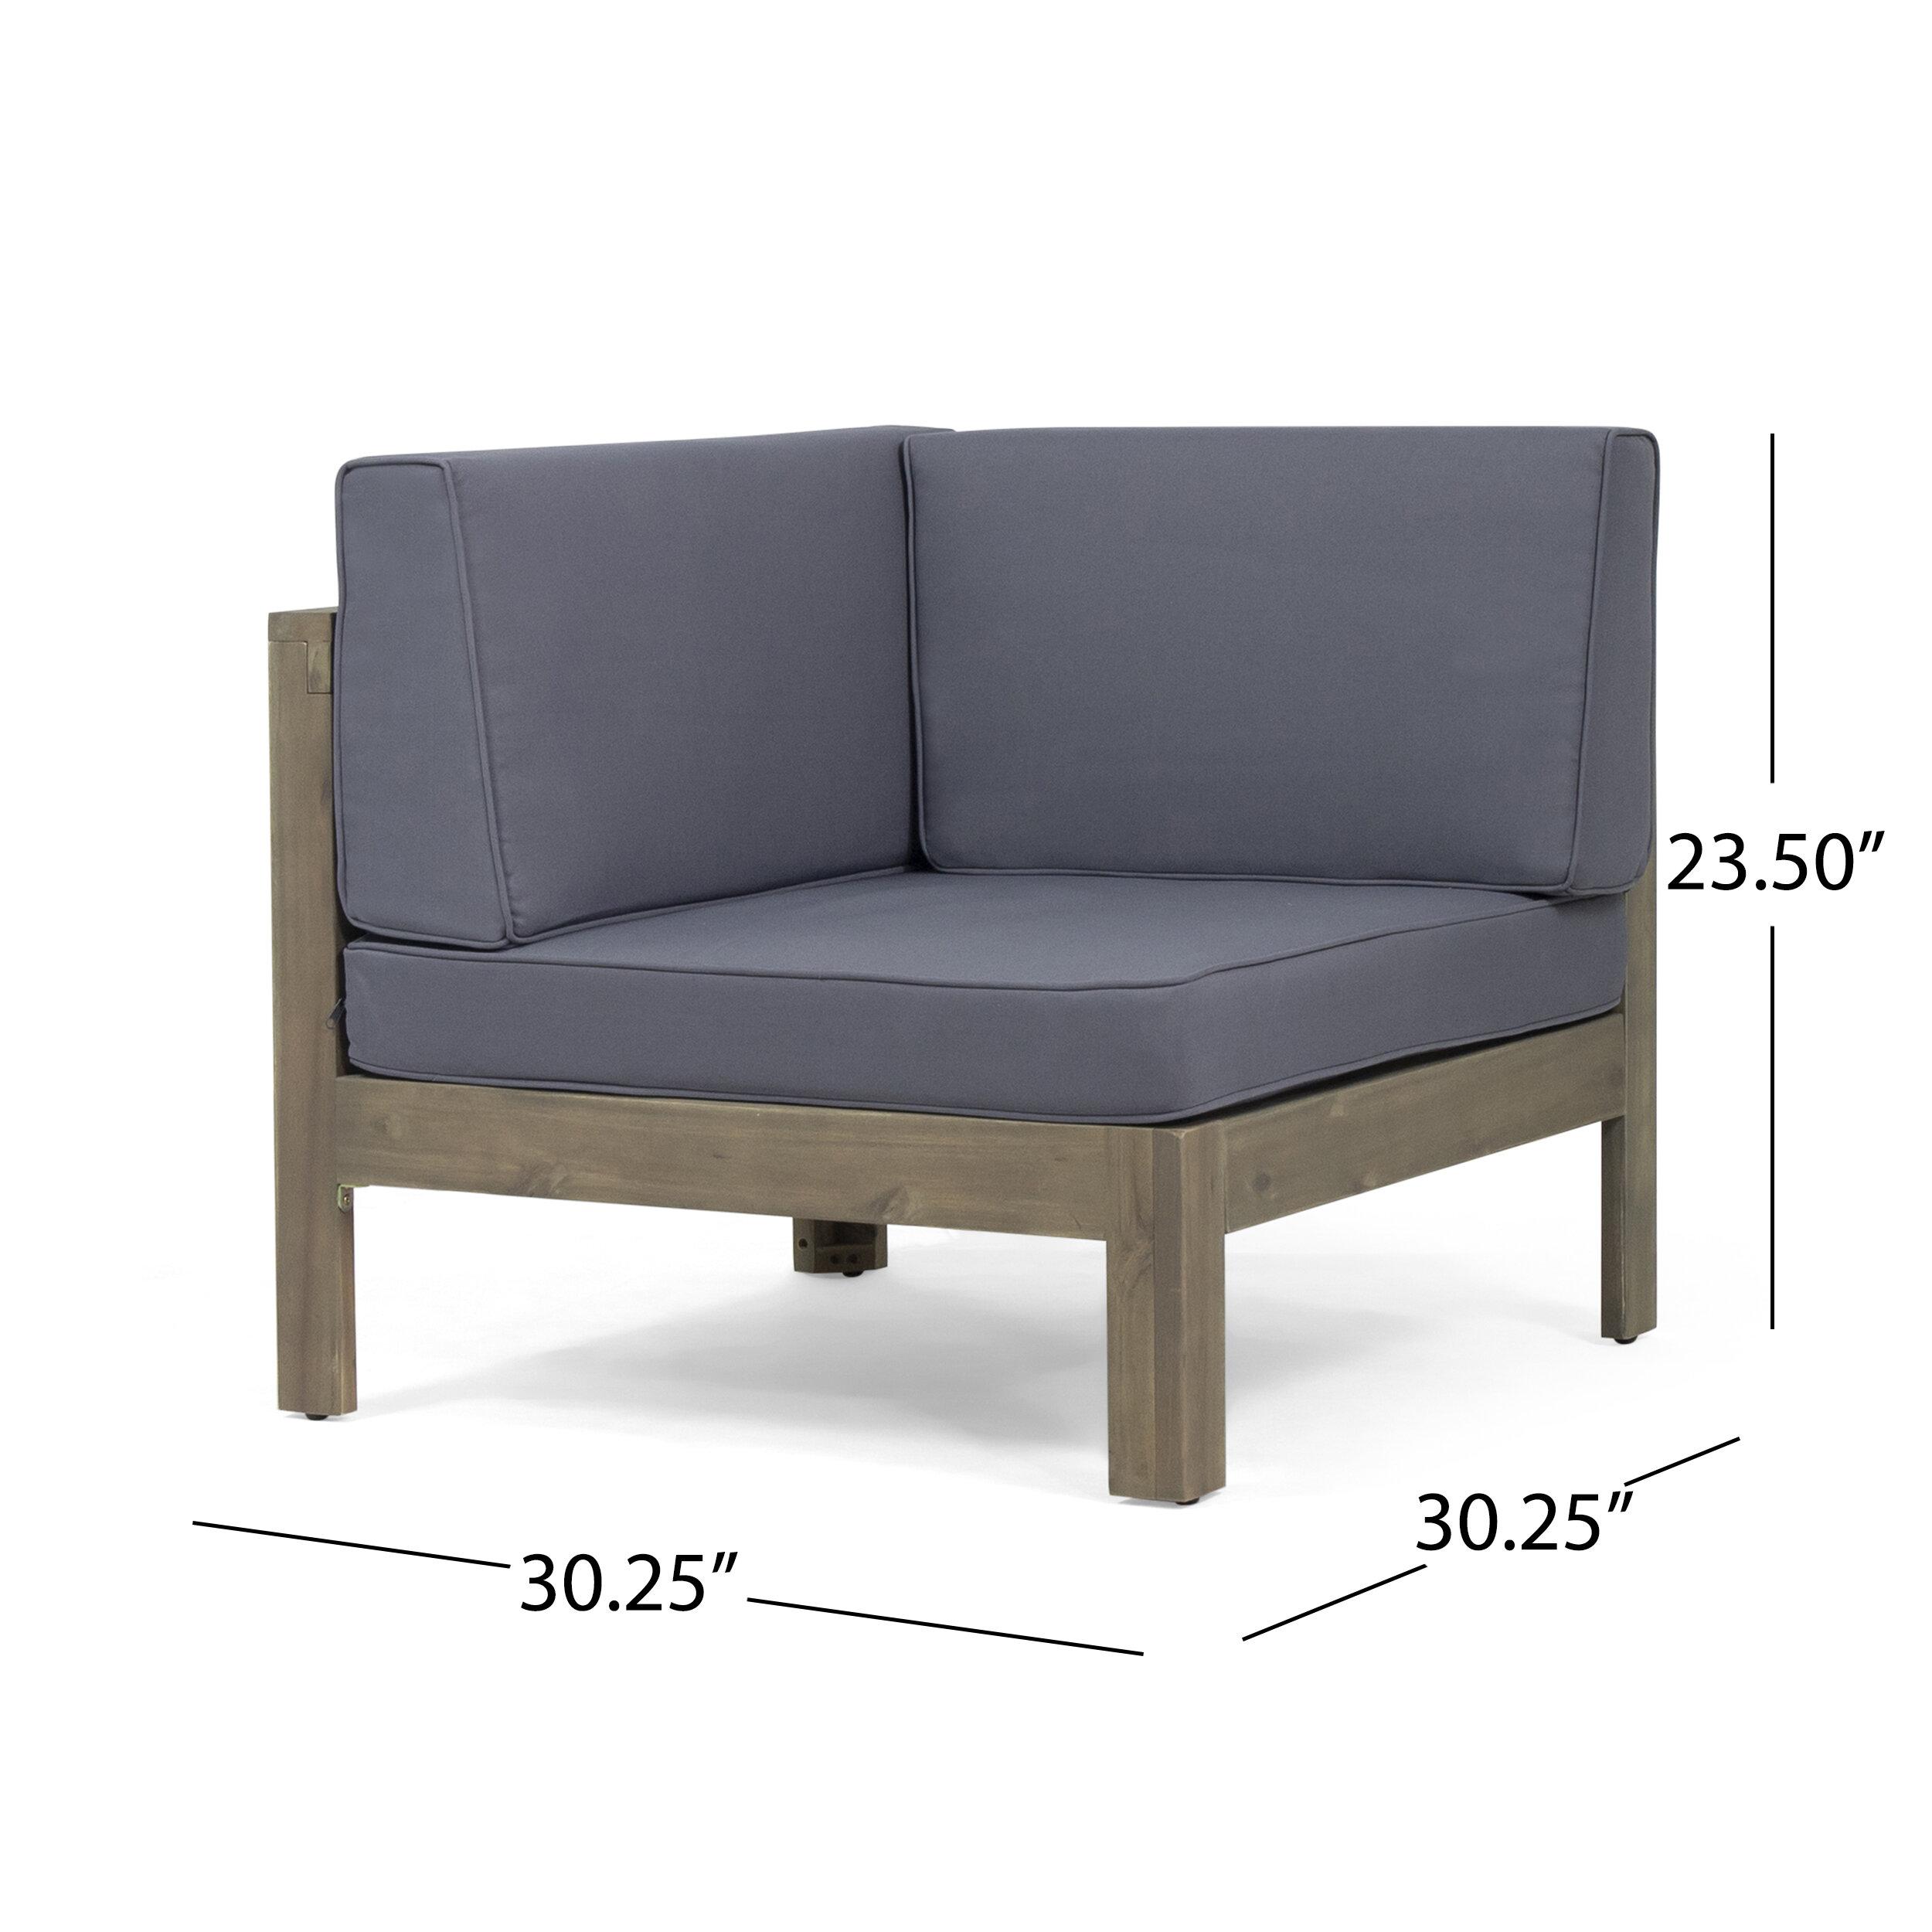 Highland Dunes Kenosha Outdoor 4 Piece Sectional Seating ... on Outdoor 4 Piece Sectional id=93817